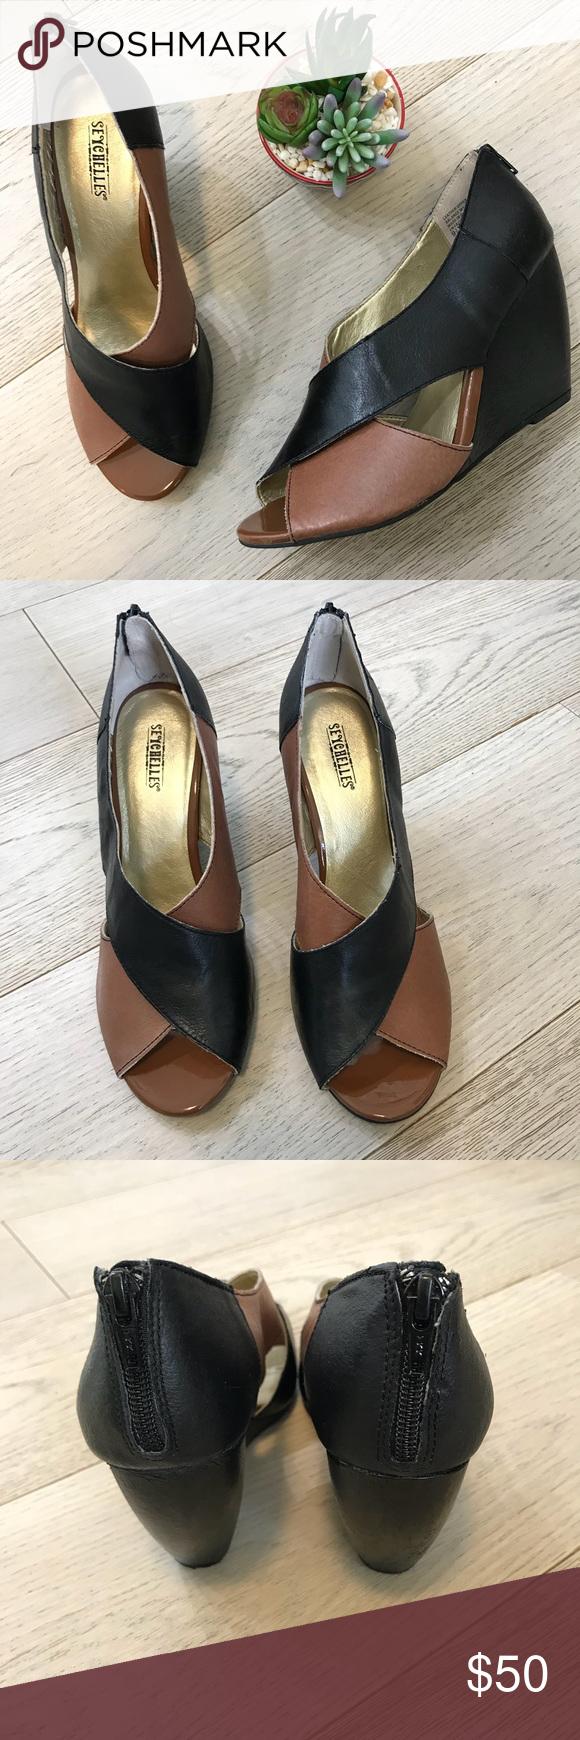 13619569e1f Seychelles two-toned black & brown peep toe wedges Seychelles two ...